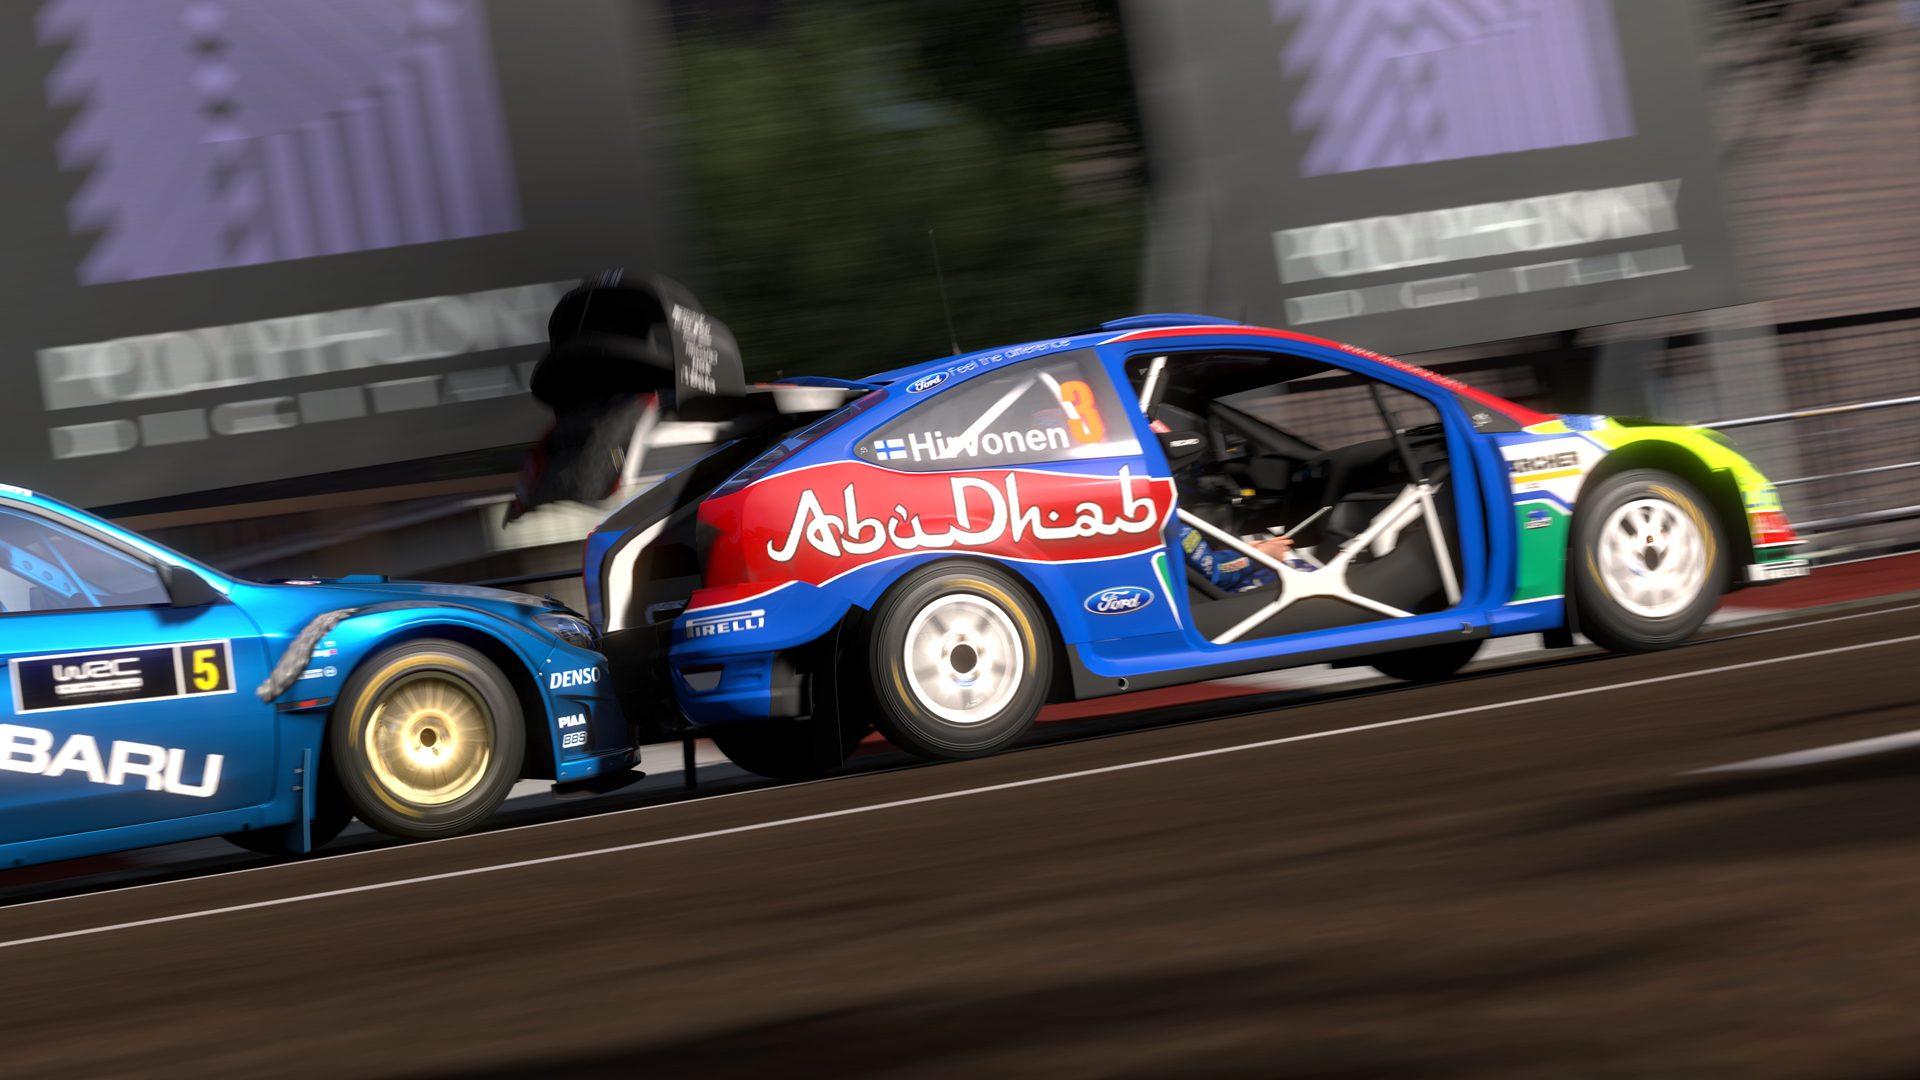 Gran Turismo 5 Screenshots Feature WRC/Race Cars